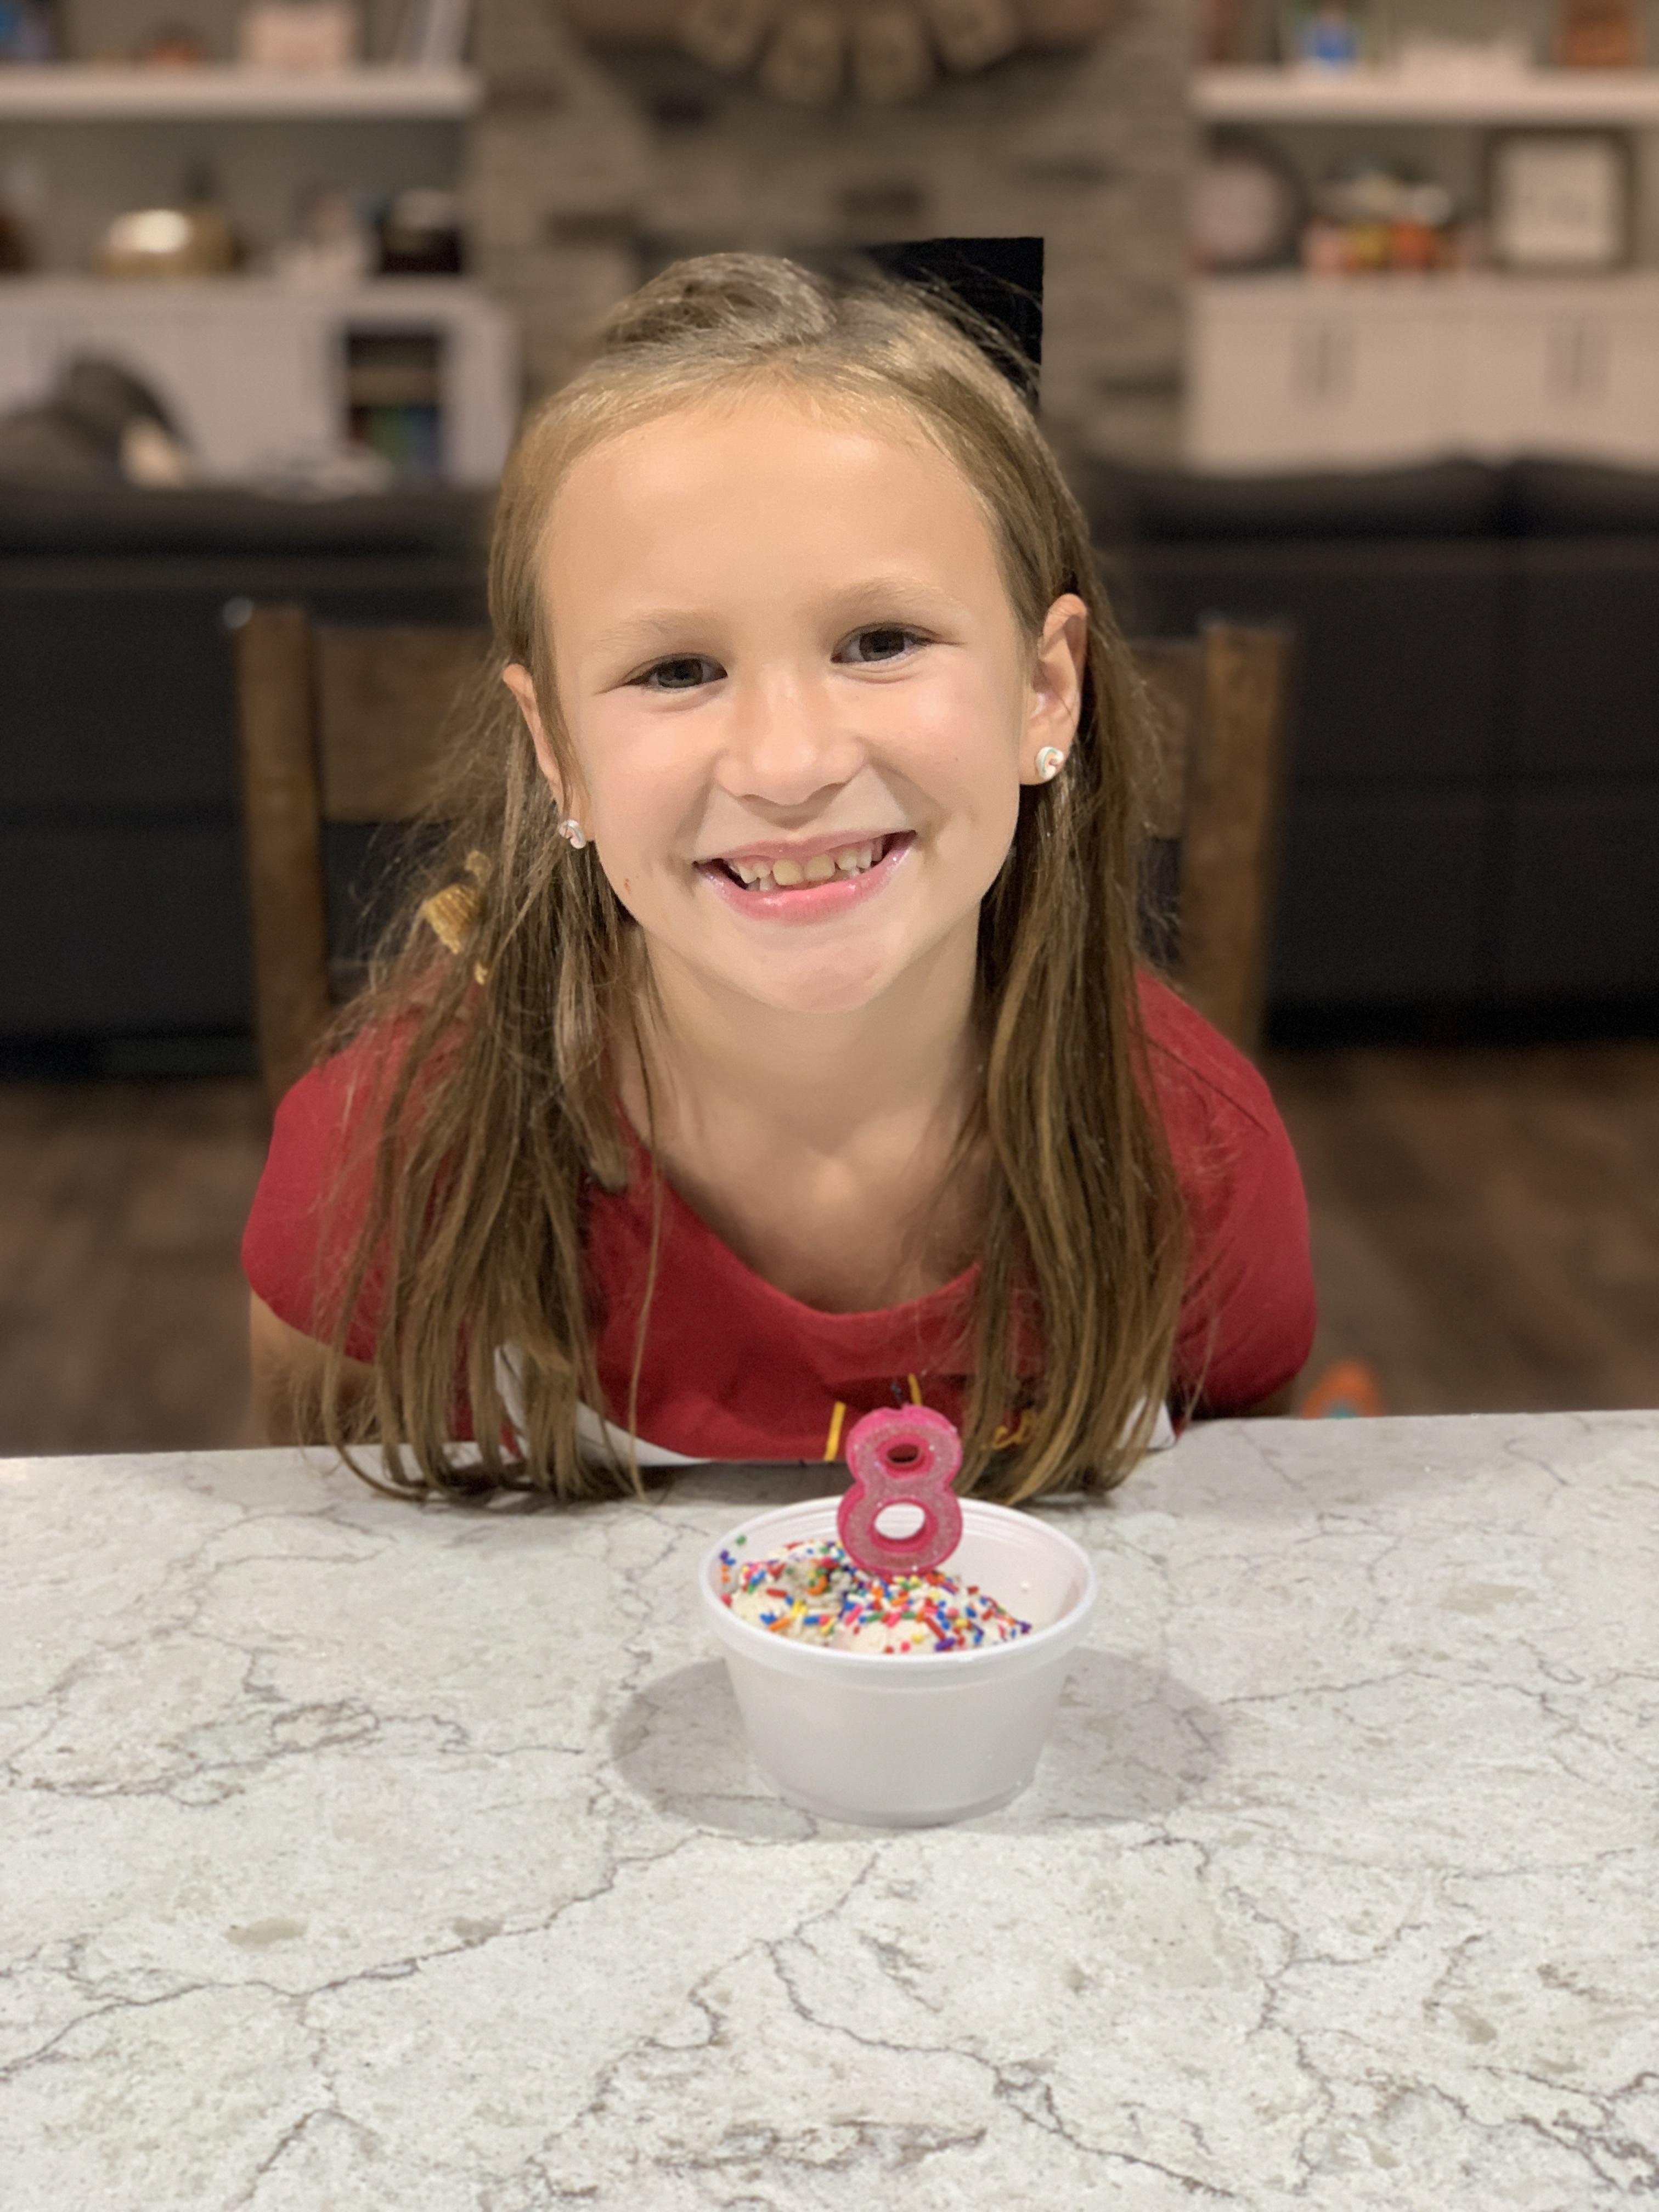 Birthday-icecream